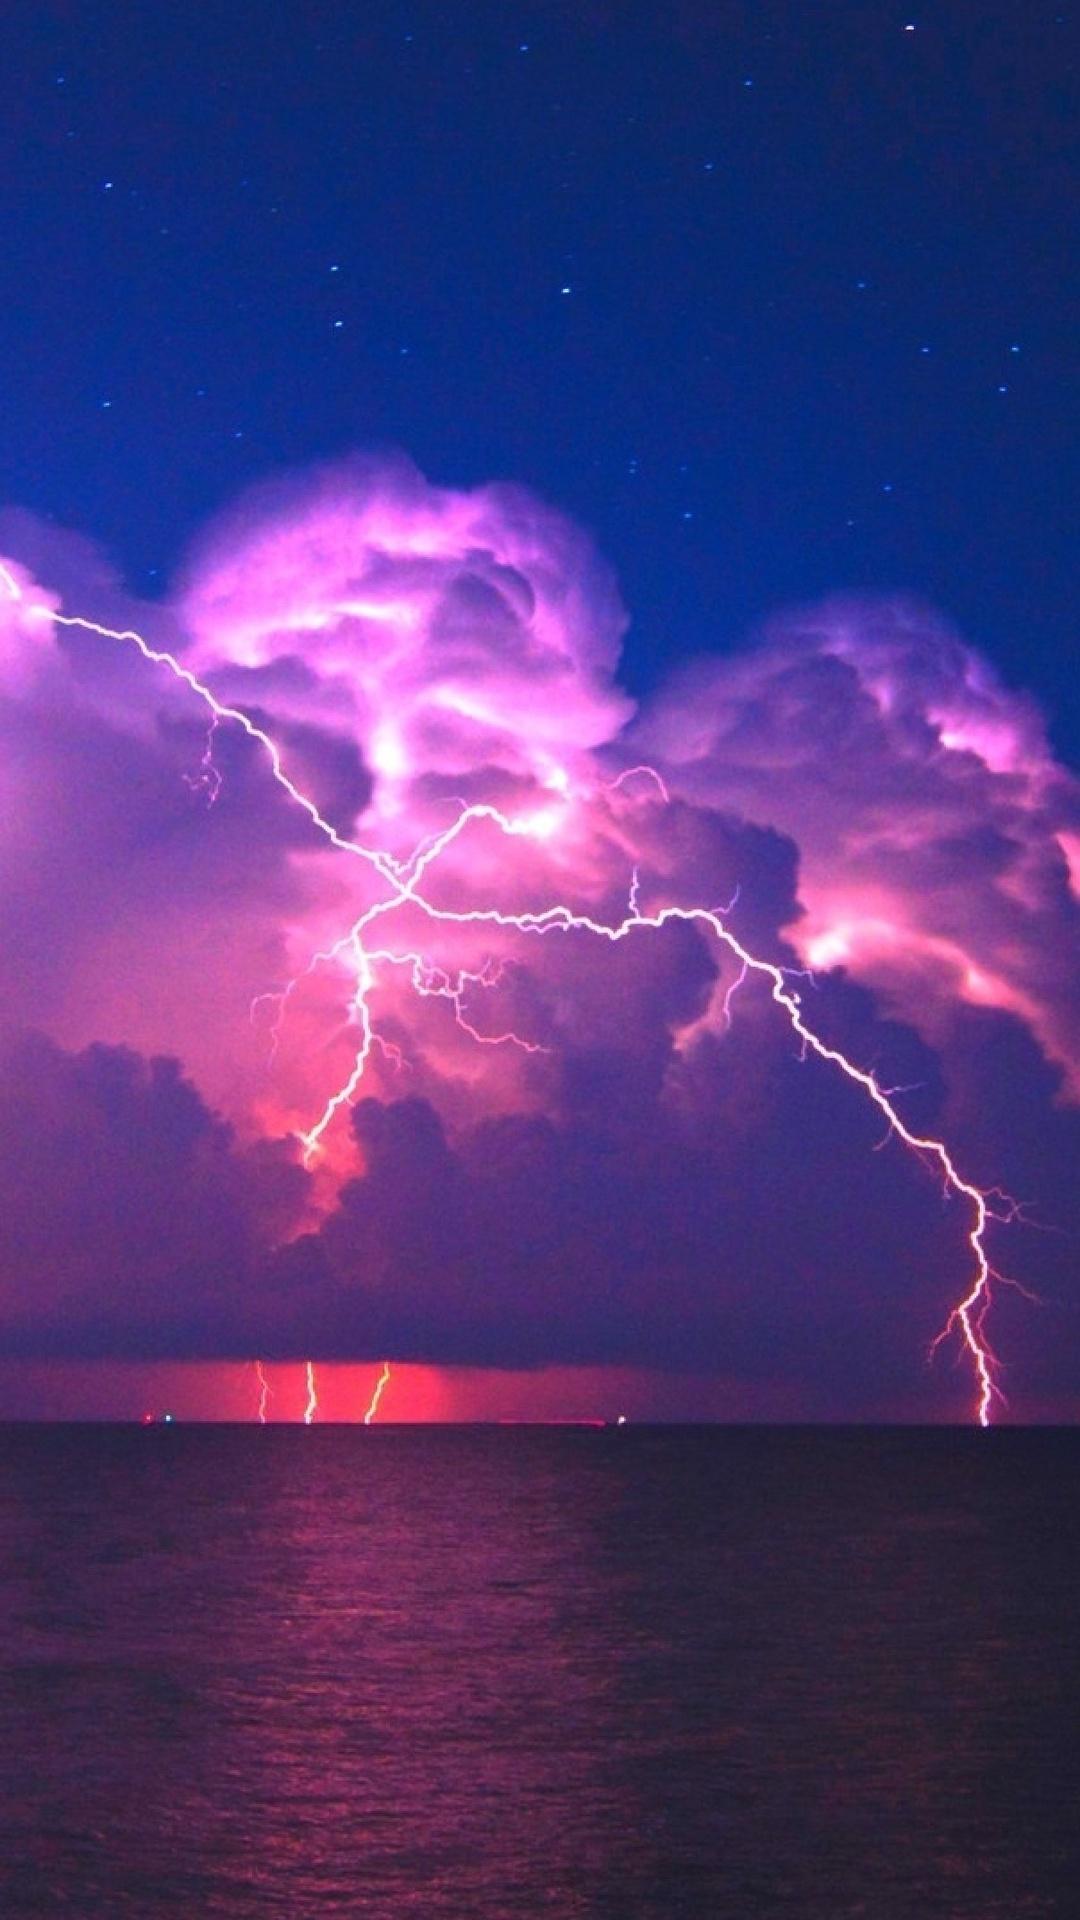 1080x1920 Lightning Pink Sky 4k Iphone 7,6s,6 Plus, Pixel ...